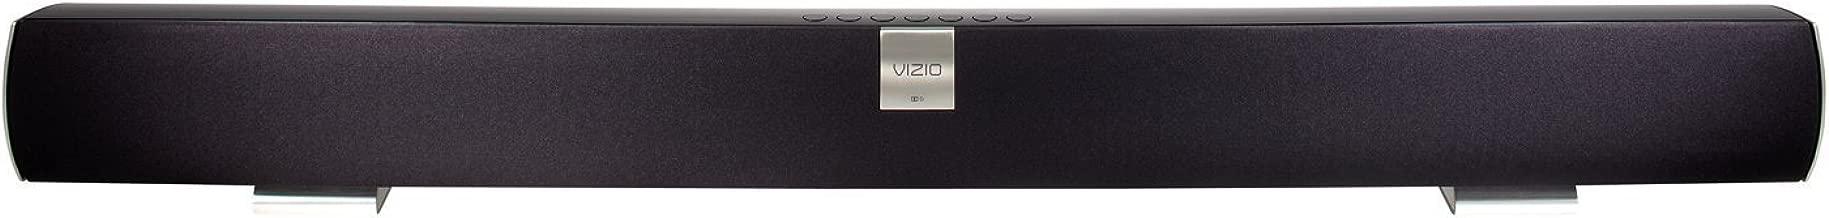 VIZIO VSB200 HD Sound Bar - SRS TruSurround HD, SRS TruVolume (Refurbished) (Certified Refurbished)